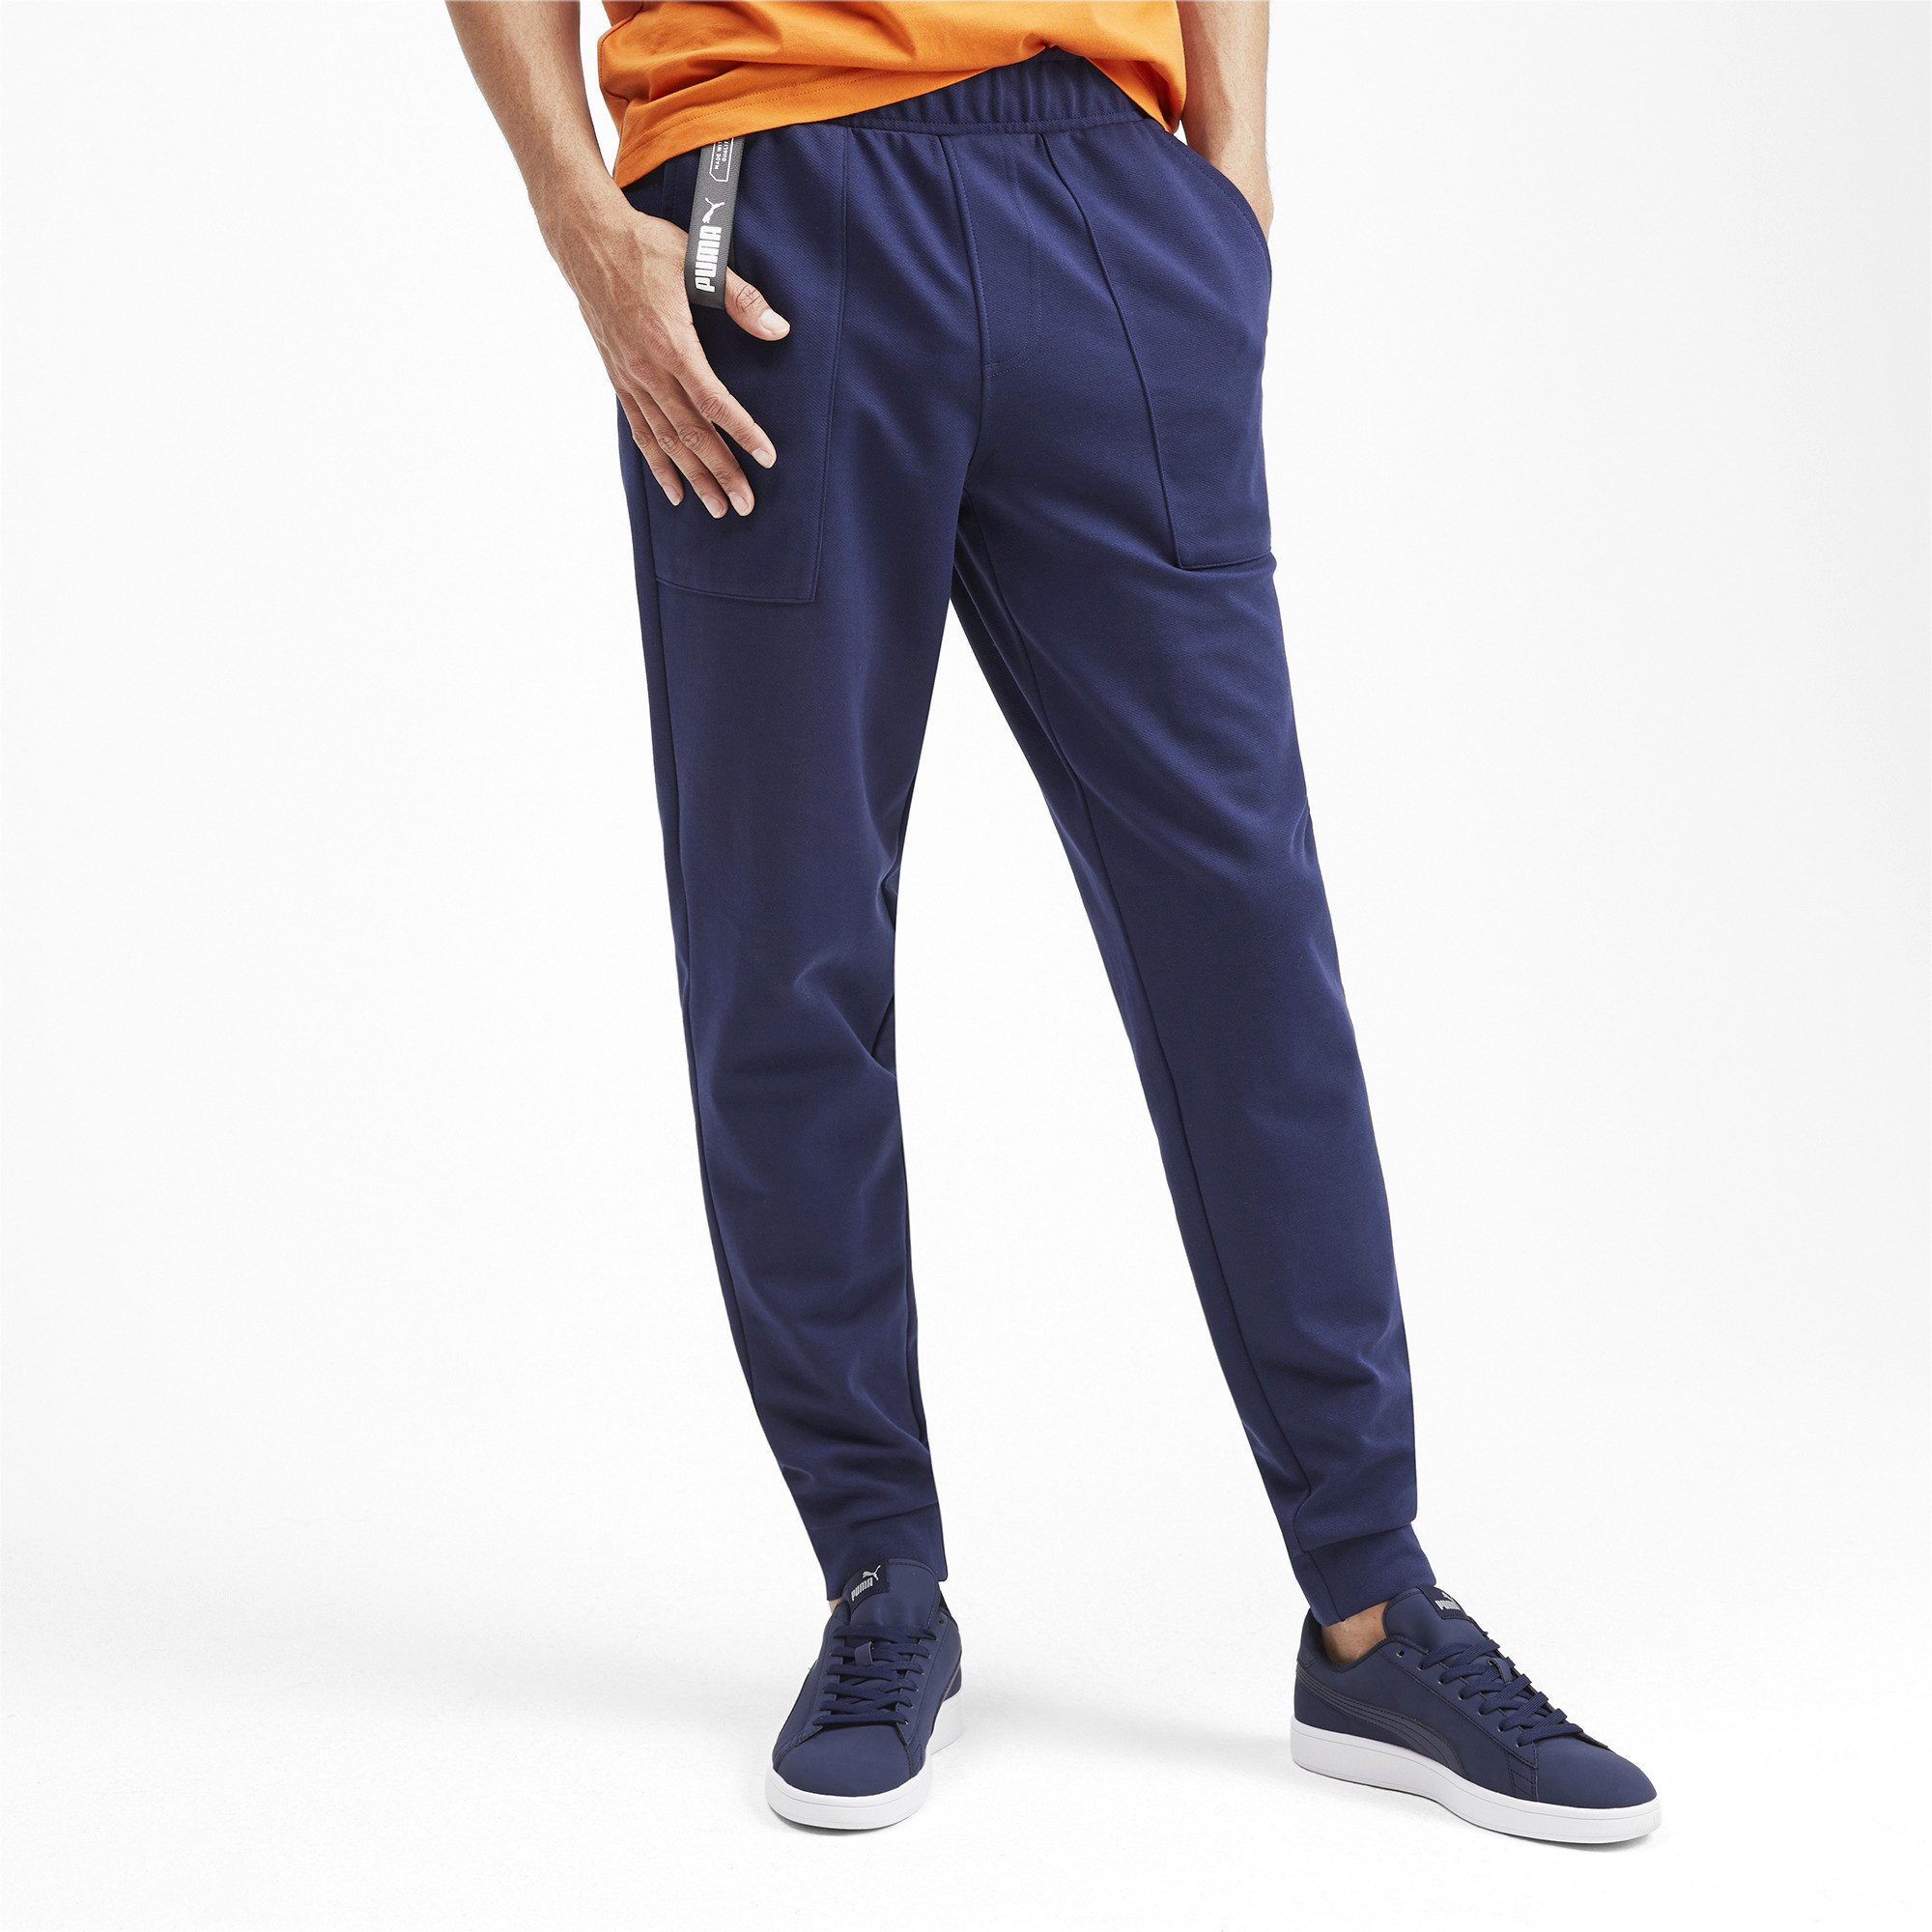 PUMA-NU-TILITY-Men-039-s-Sweatpants-Men-Knitted-Pants-Basics thumbnail 9